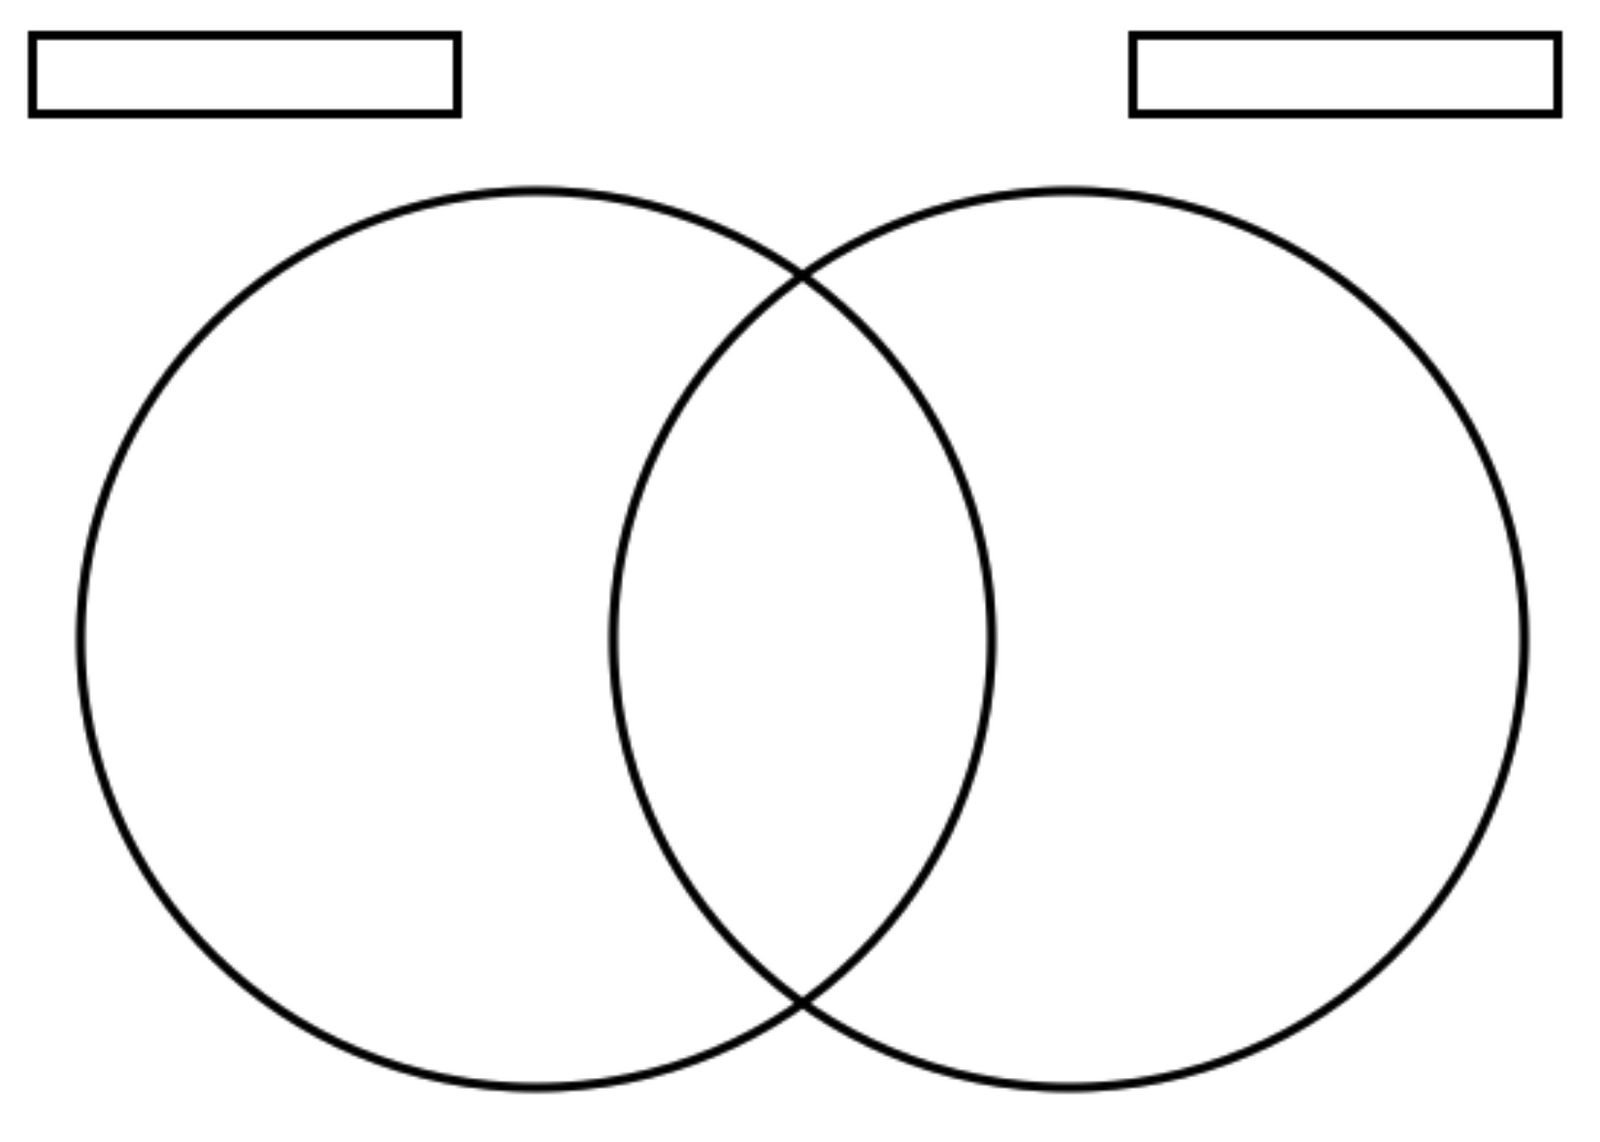 Venn Diagram Answers About Animals True Freezer Wiring Template School Stuff Pinterest